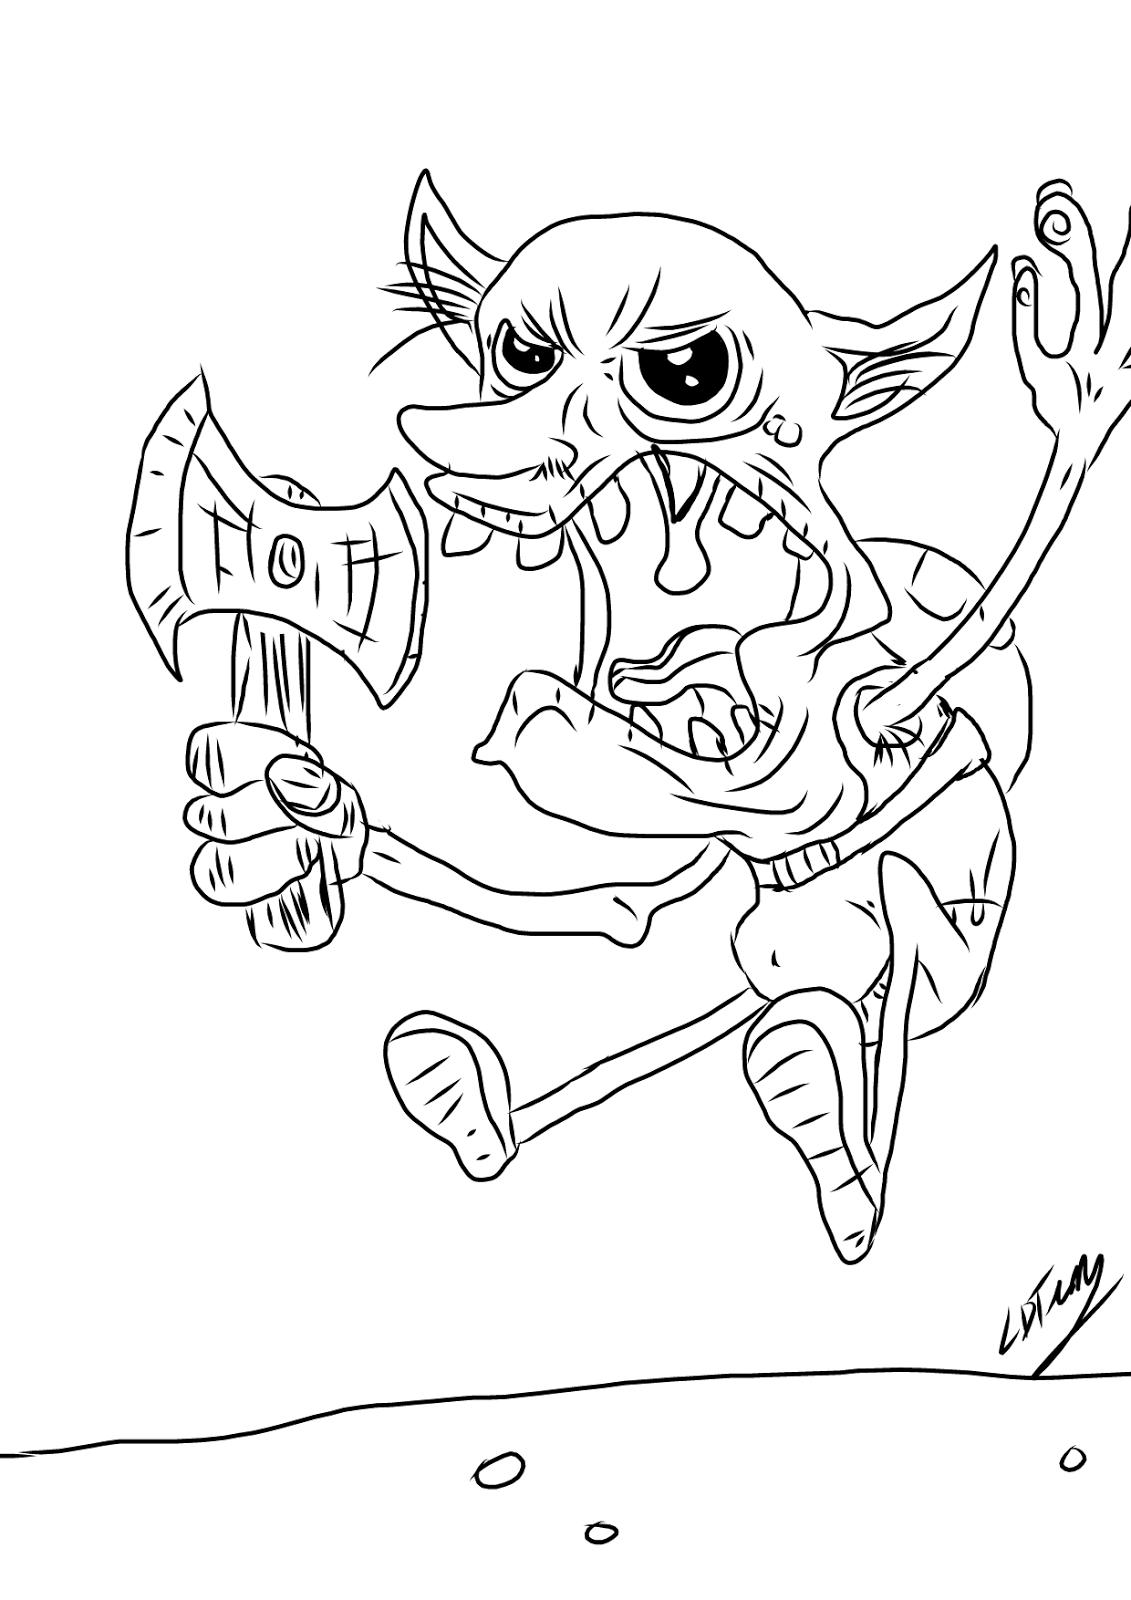 Favour in Fun: Goblins